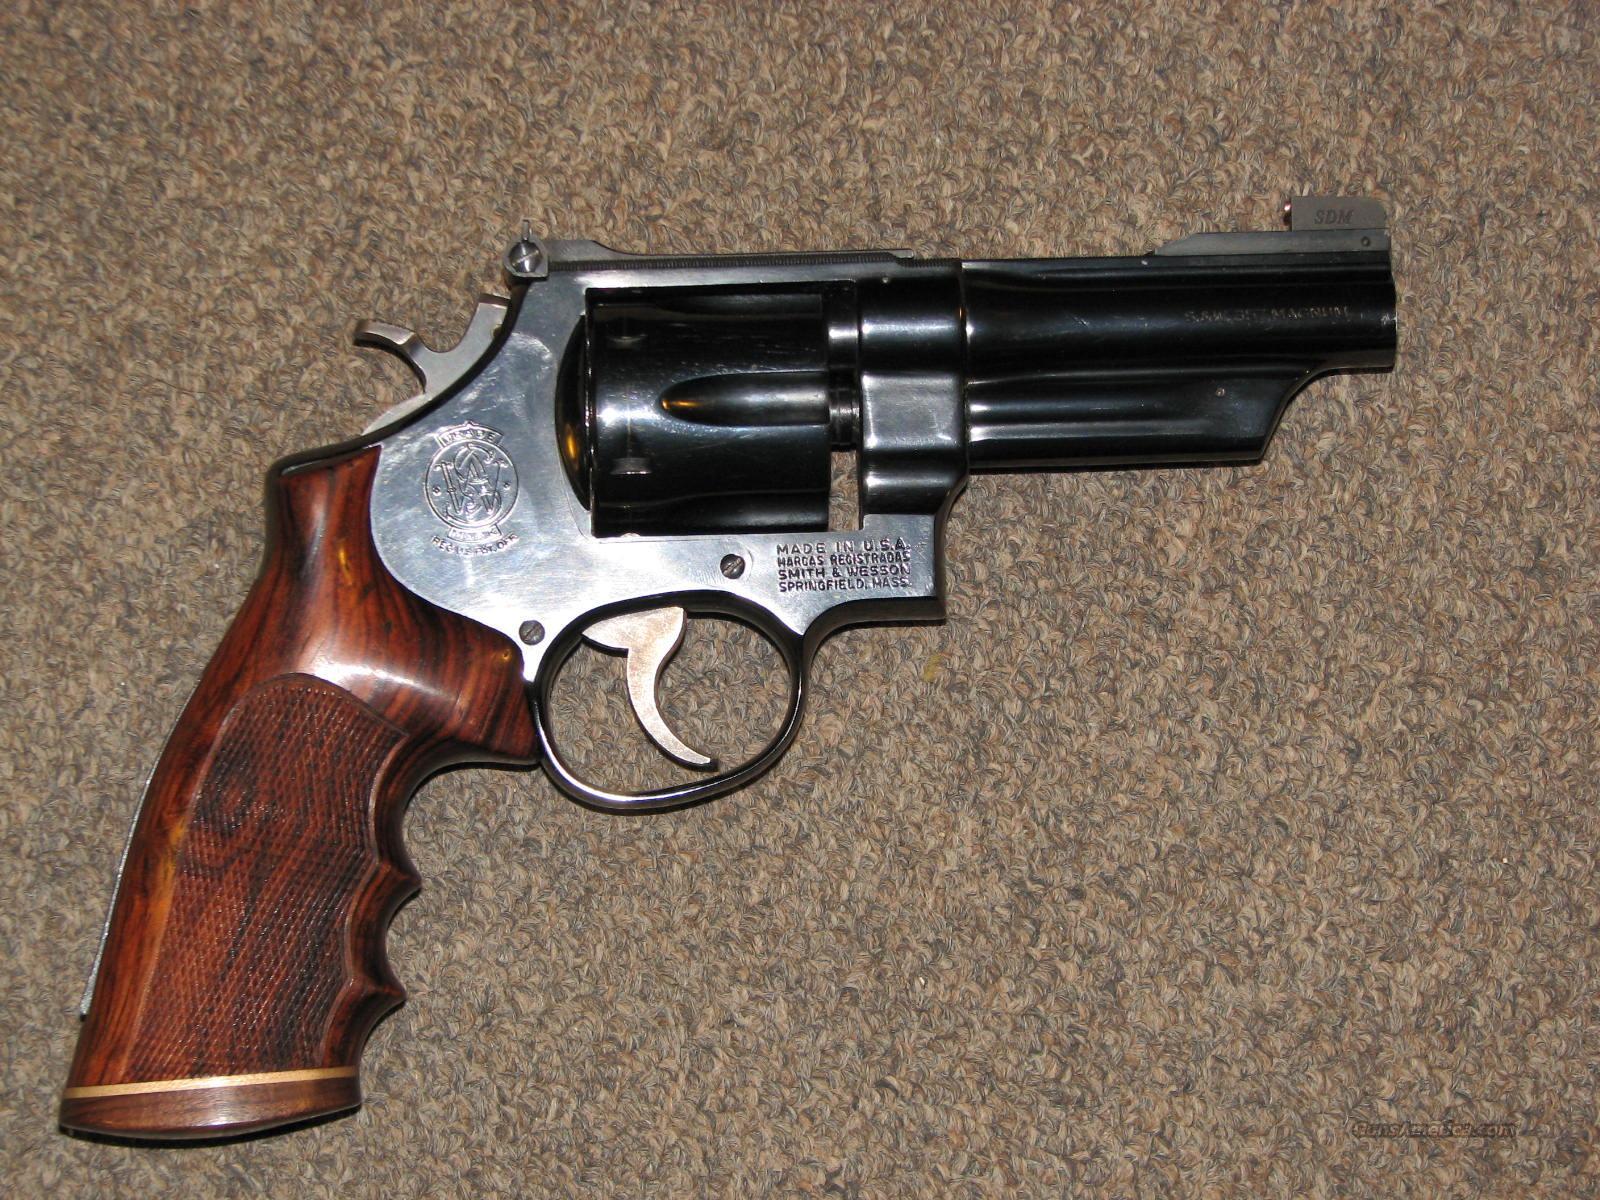 "SMITH & WESSON 27-2 .357 MAG - 4""  Guns > Pistols > Smith & Wesson Revolvers > Full Frame Revolver"